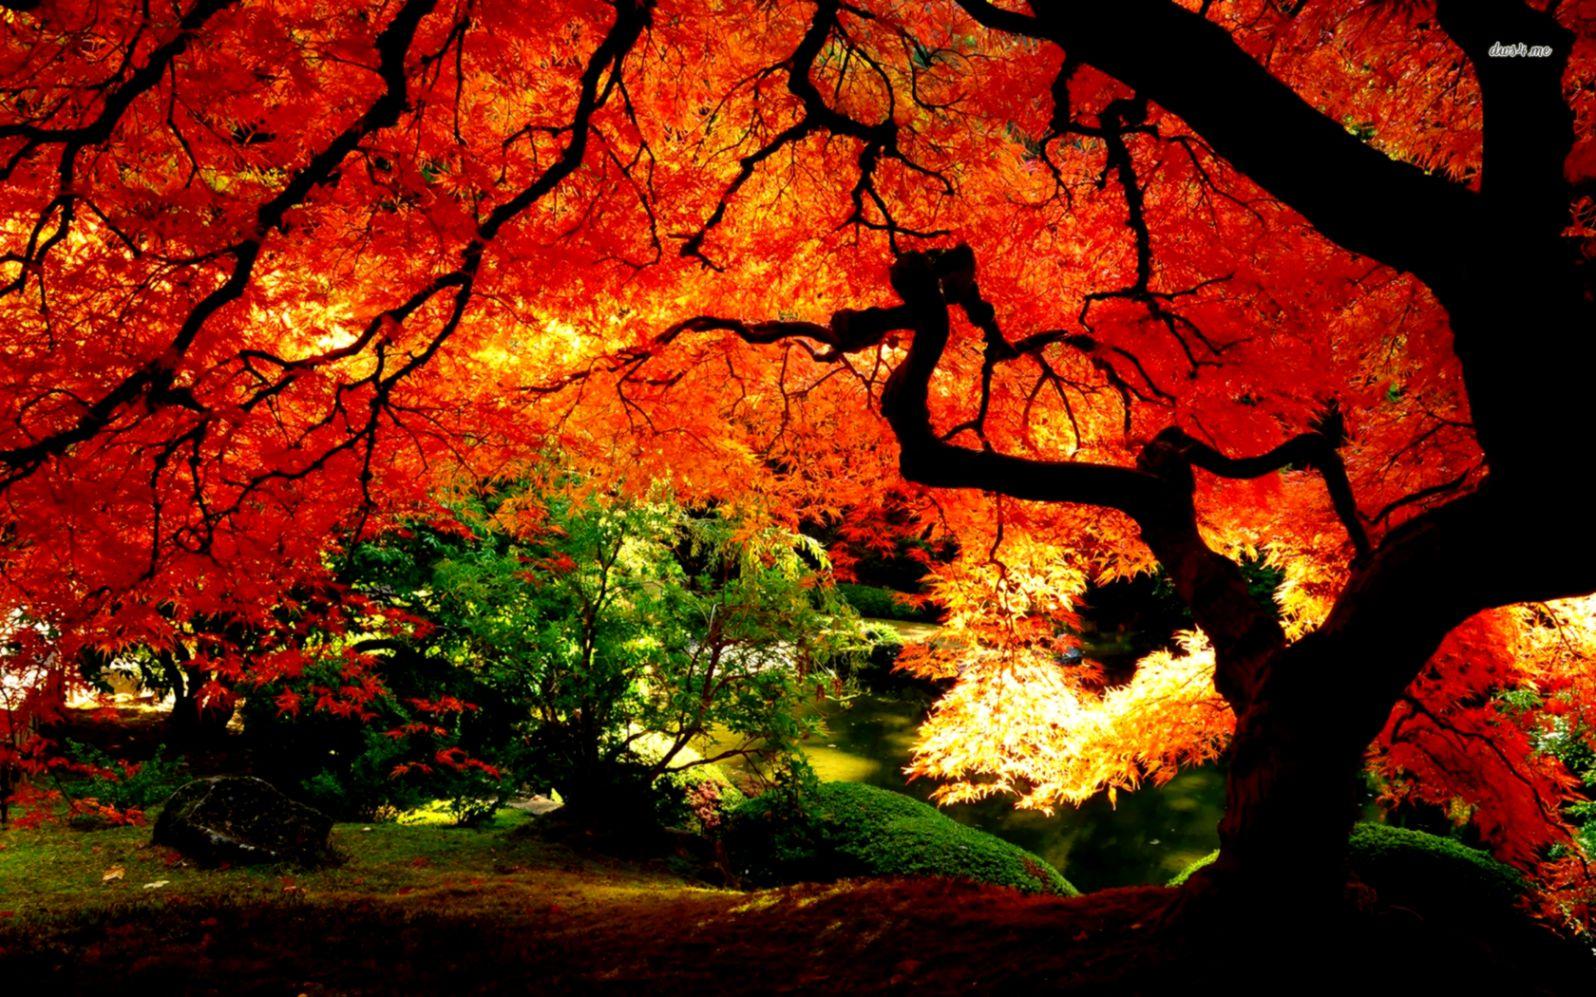 Fall Landscaping Garden Design Garden Design With Fall Landscape Wallpapers